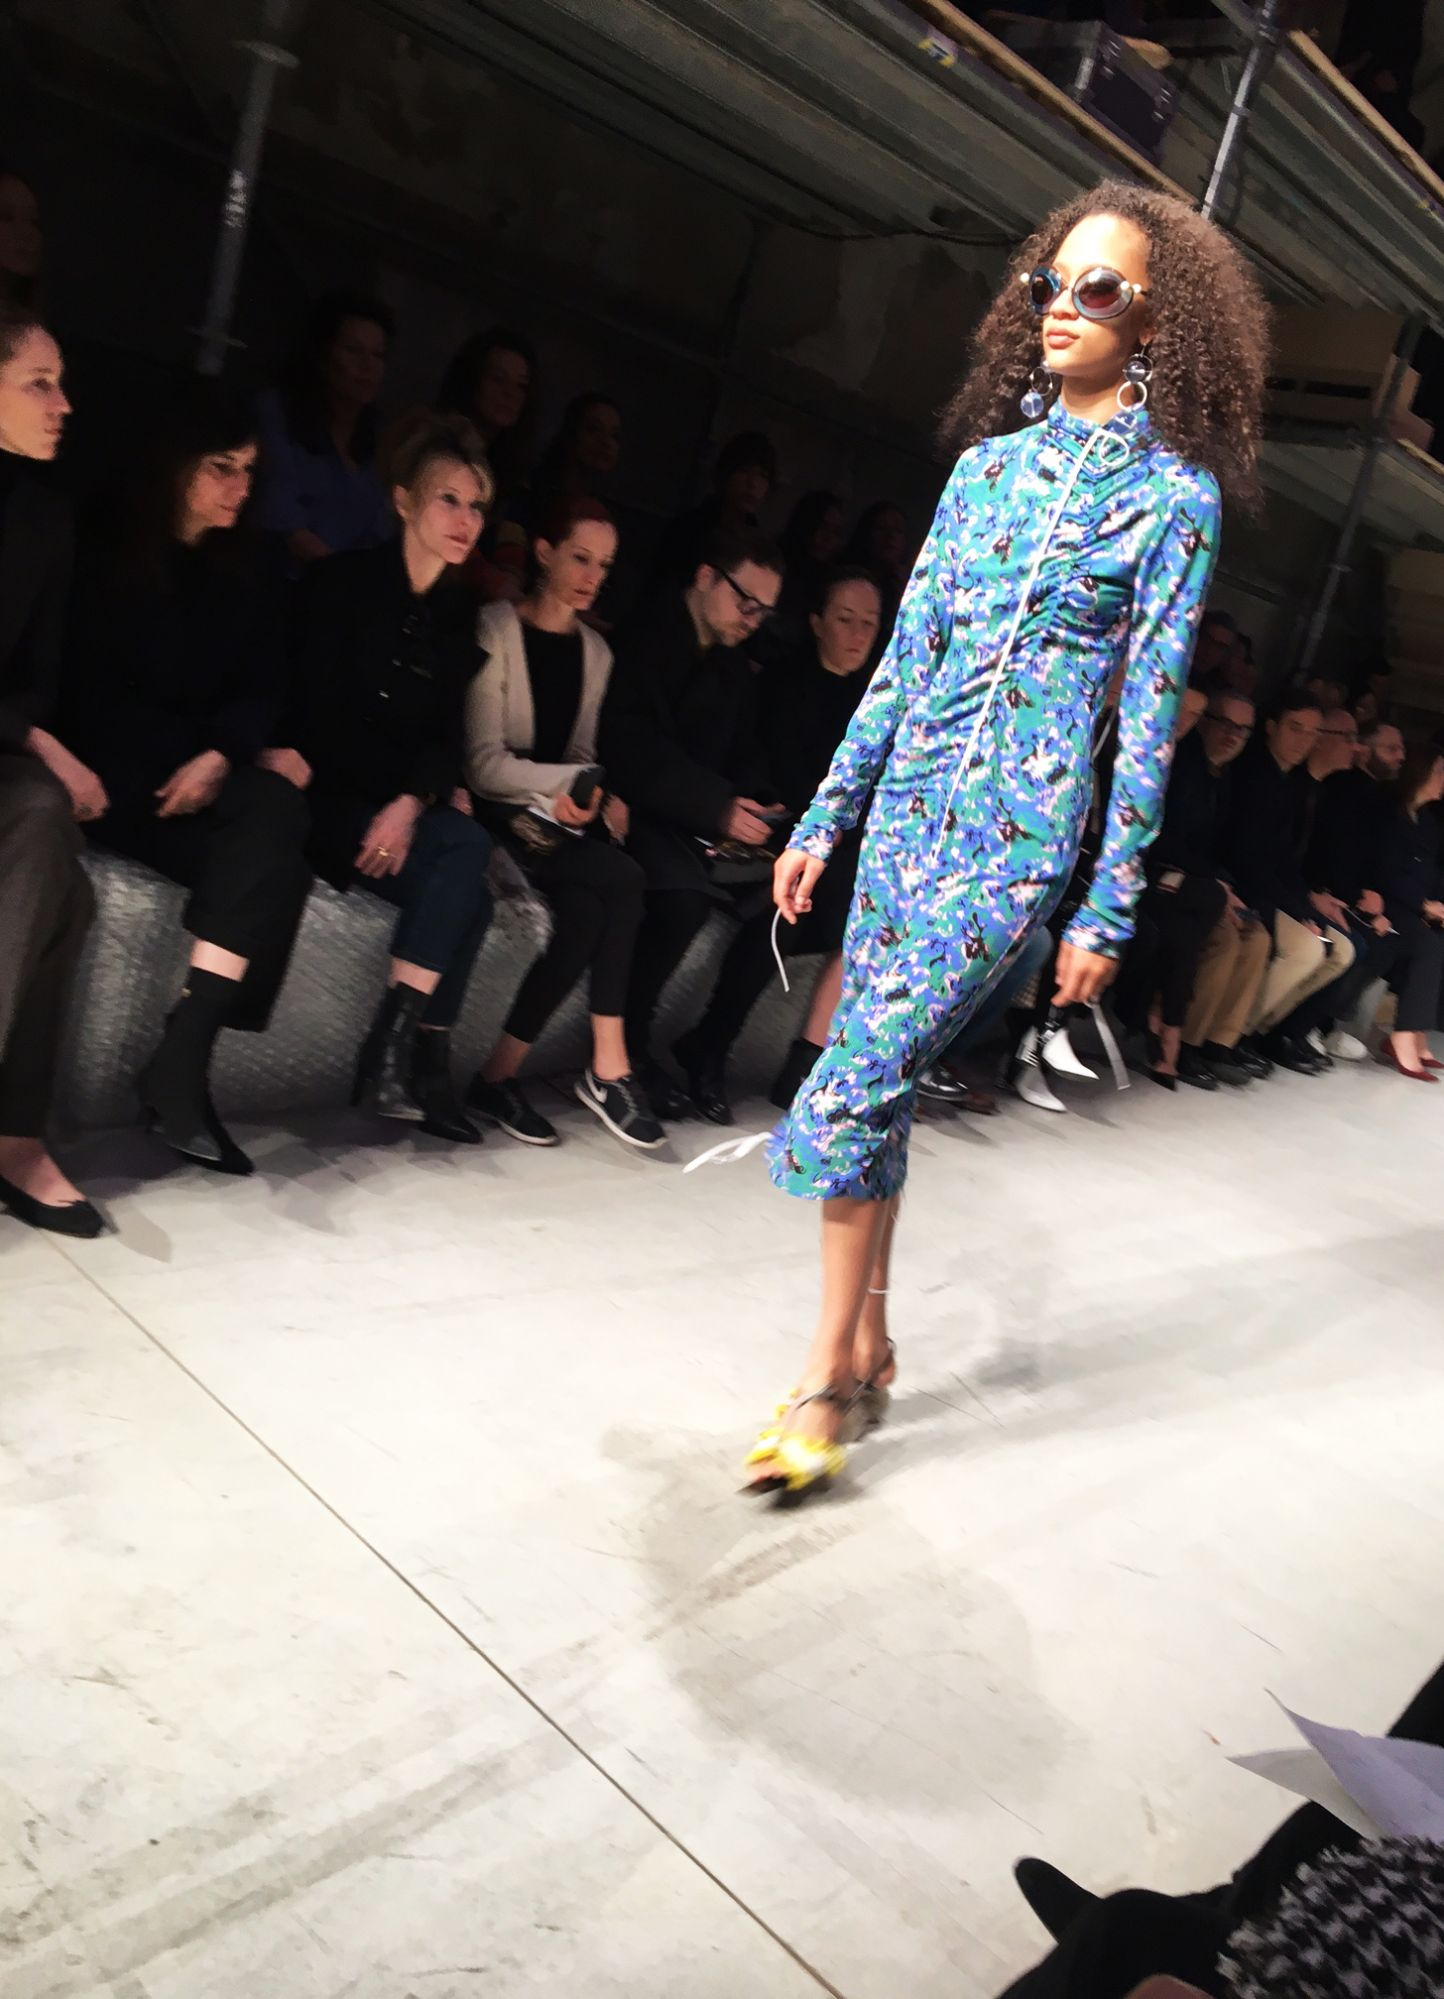 Milan Fashion Week Highlights: Marni, D&G and Jamie Foxx